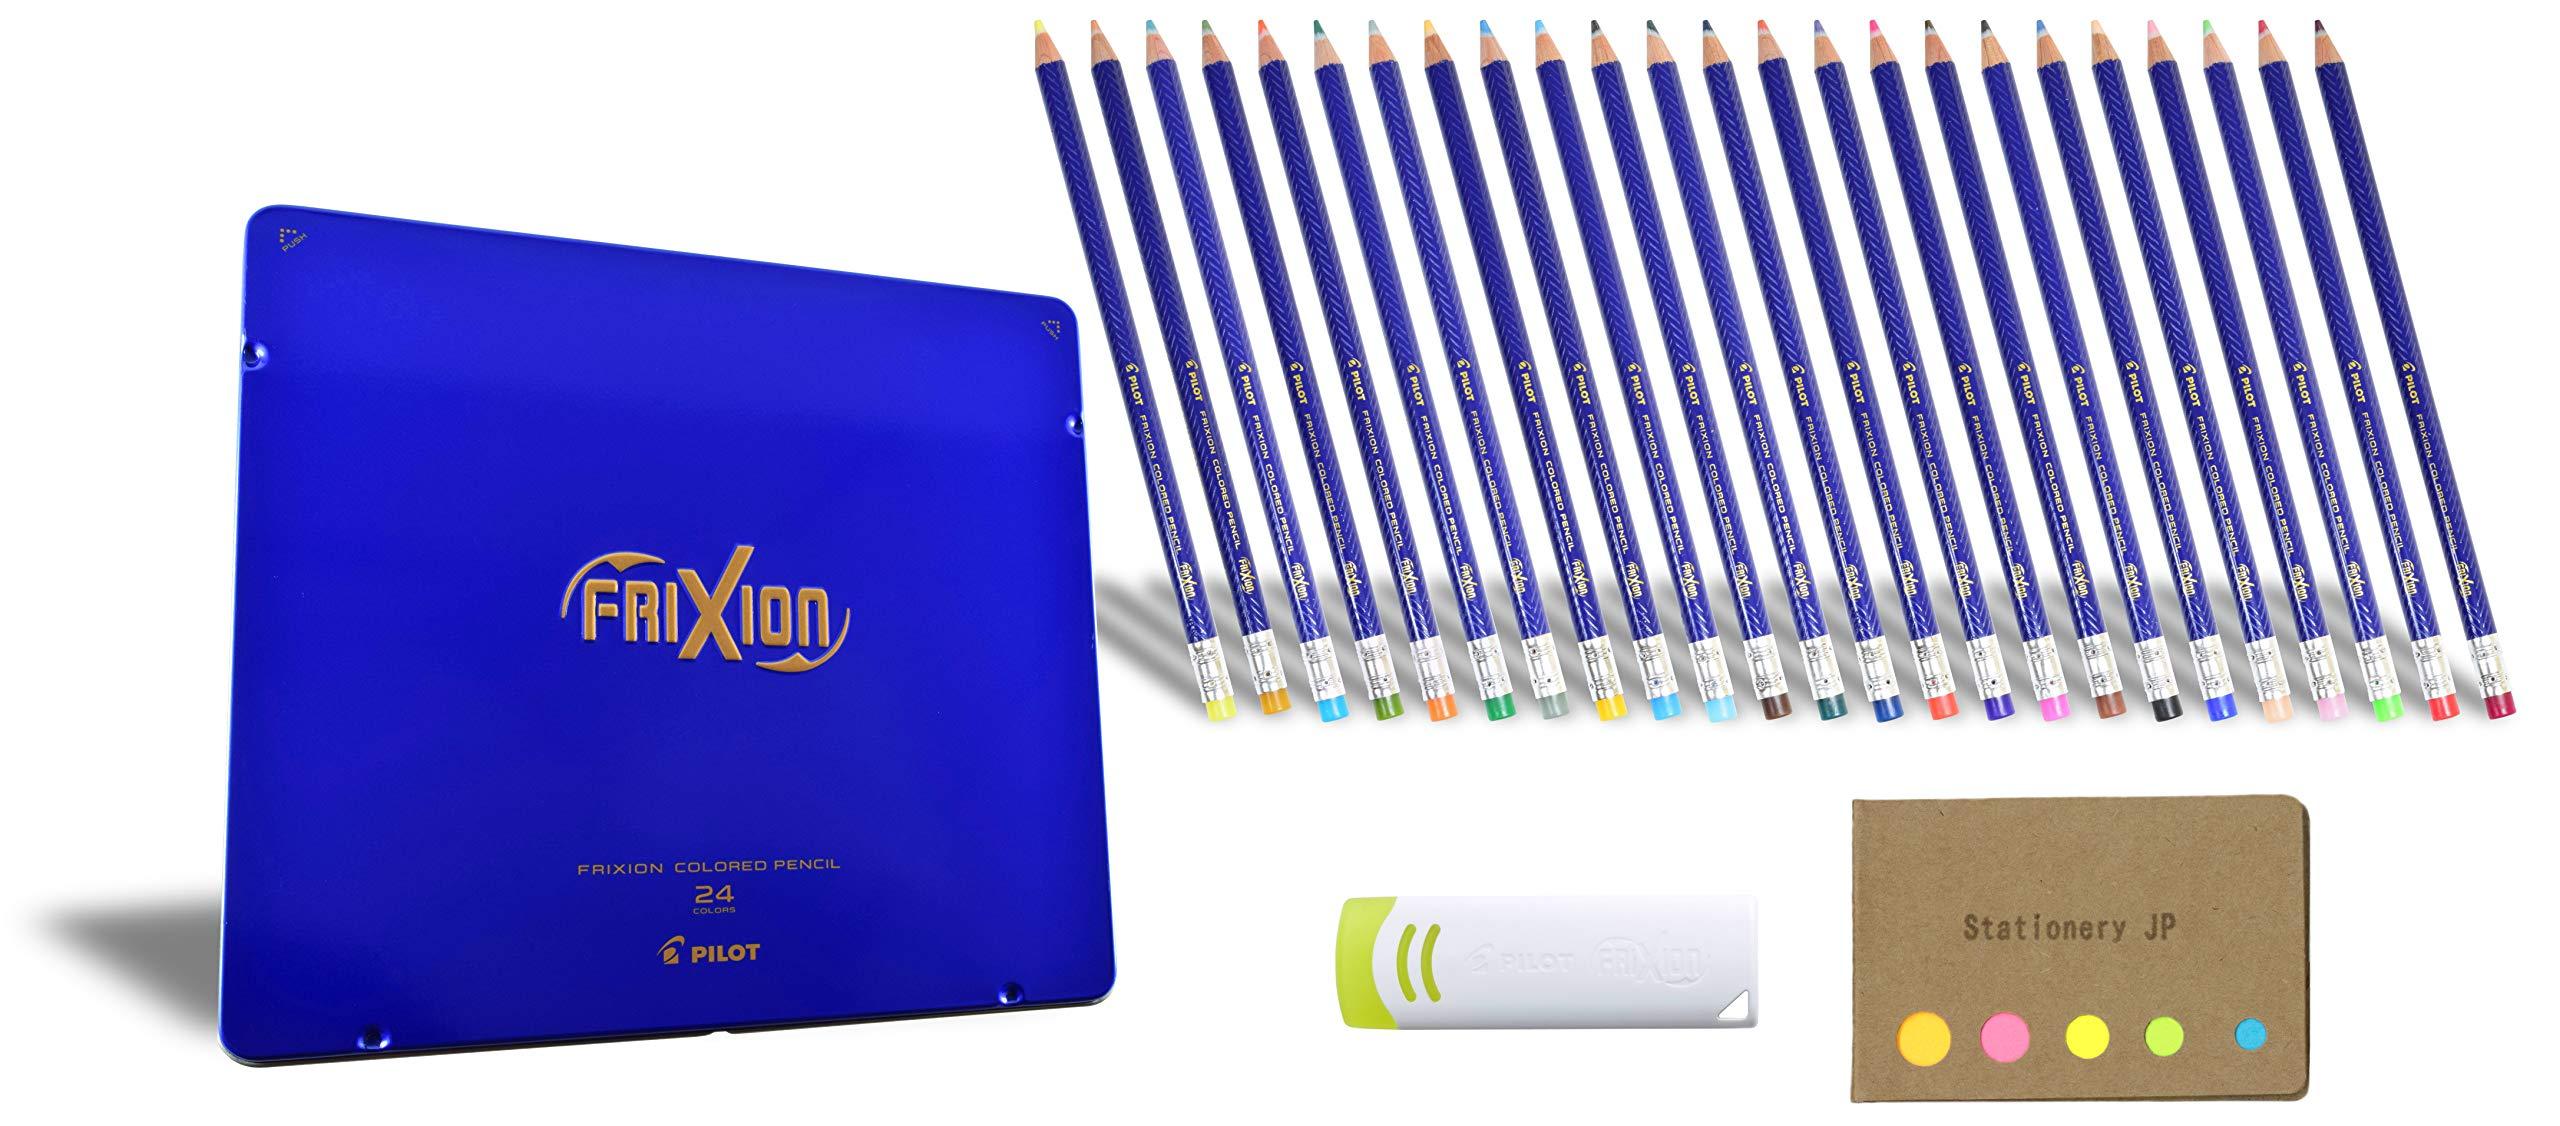 Pilot FriXion Erasable Colored Pencil 24 Color, Frixion Eraser, Pen Case, Sticky Notes Value Set by Stationery JP (Image #1)